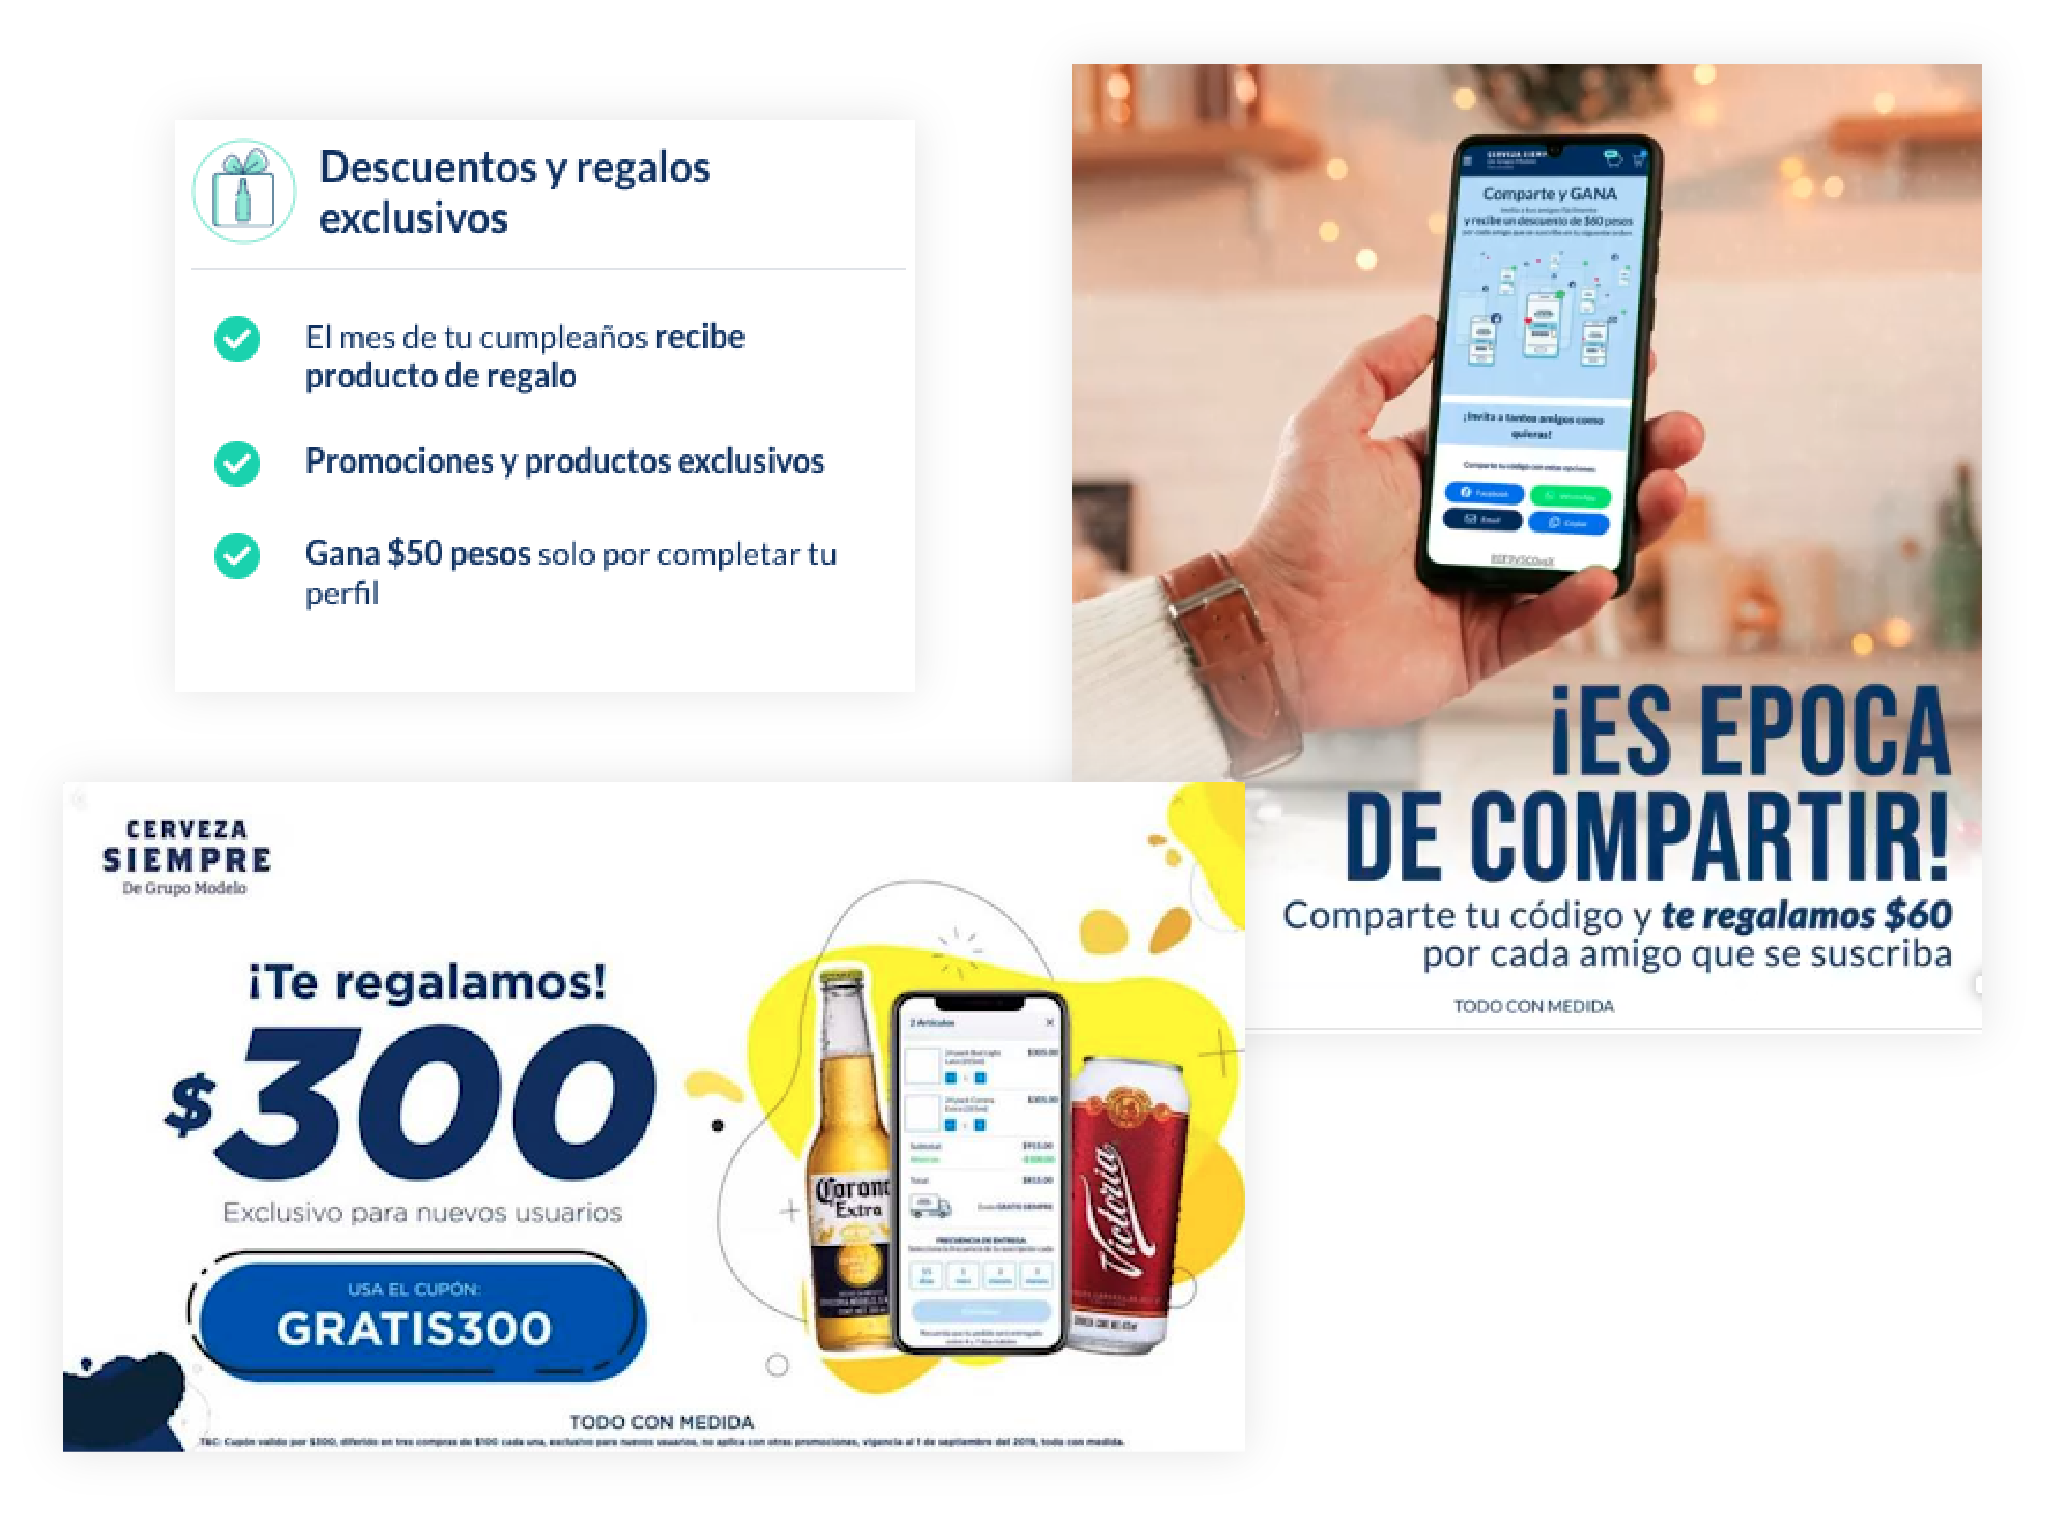 Illustrations of Cerveza Siempre promotions